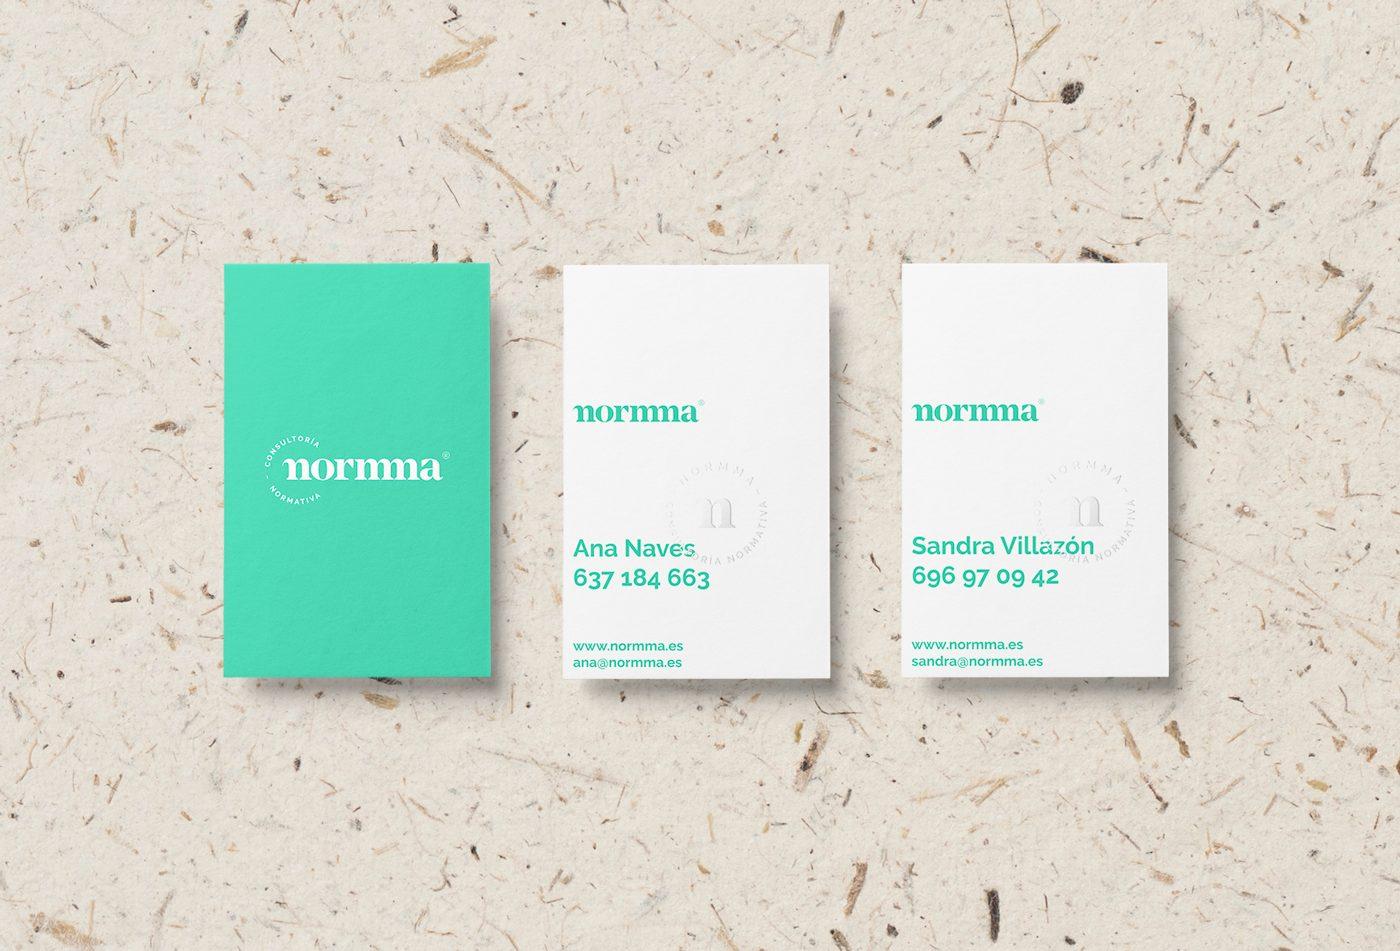 Normma tarjetas, identidad visual